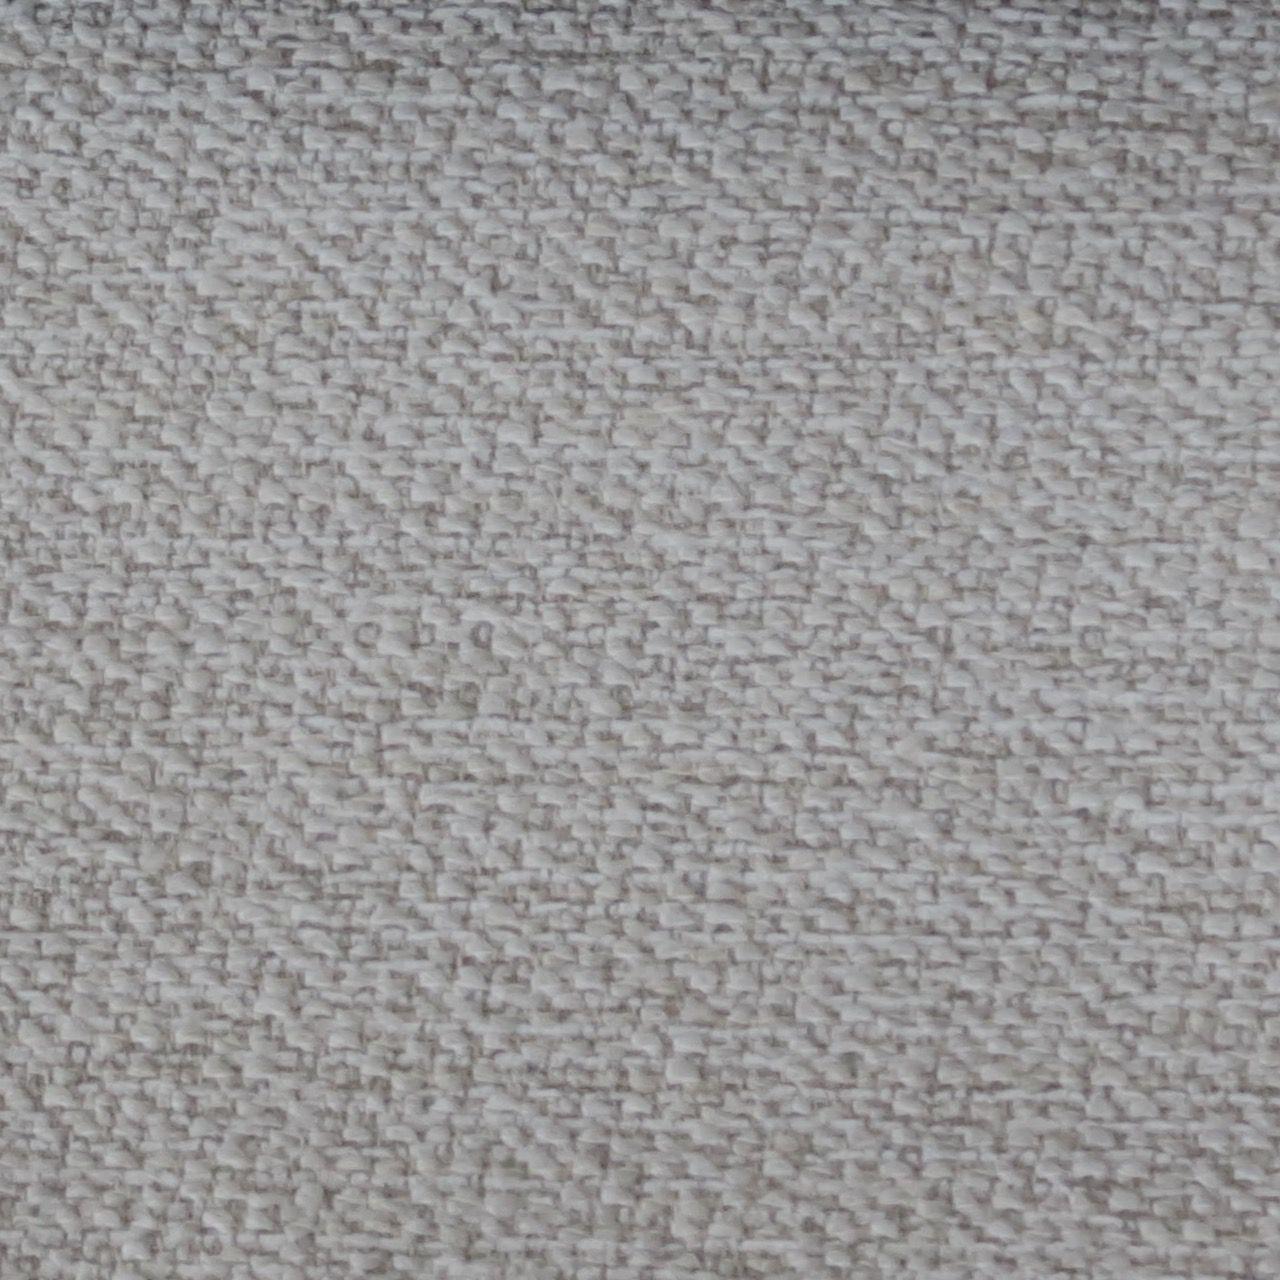 Fern Weave 04 - Fabric